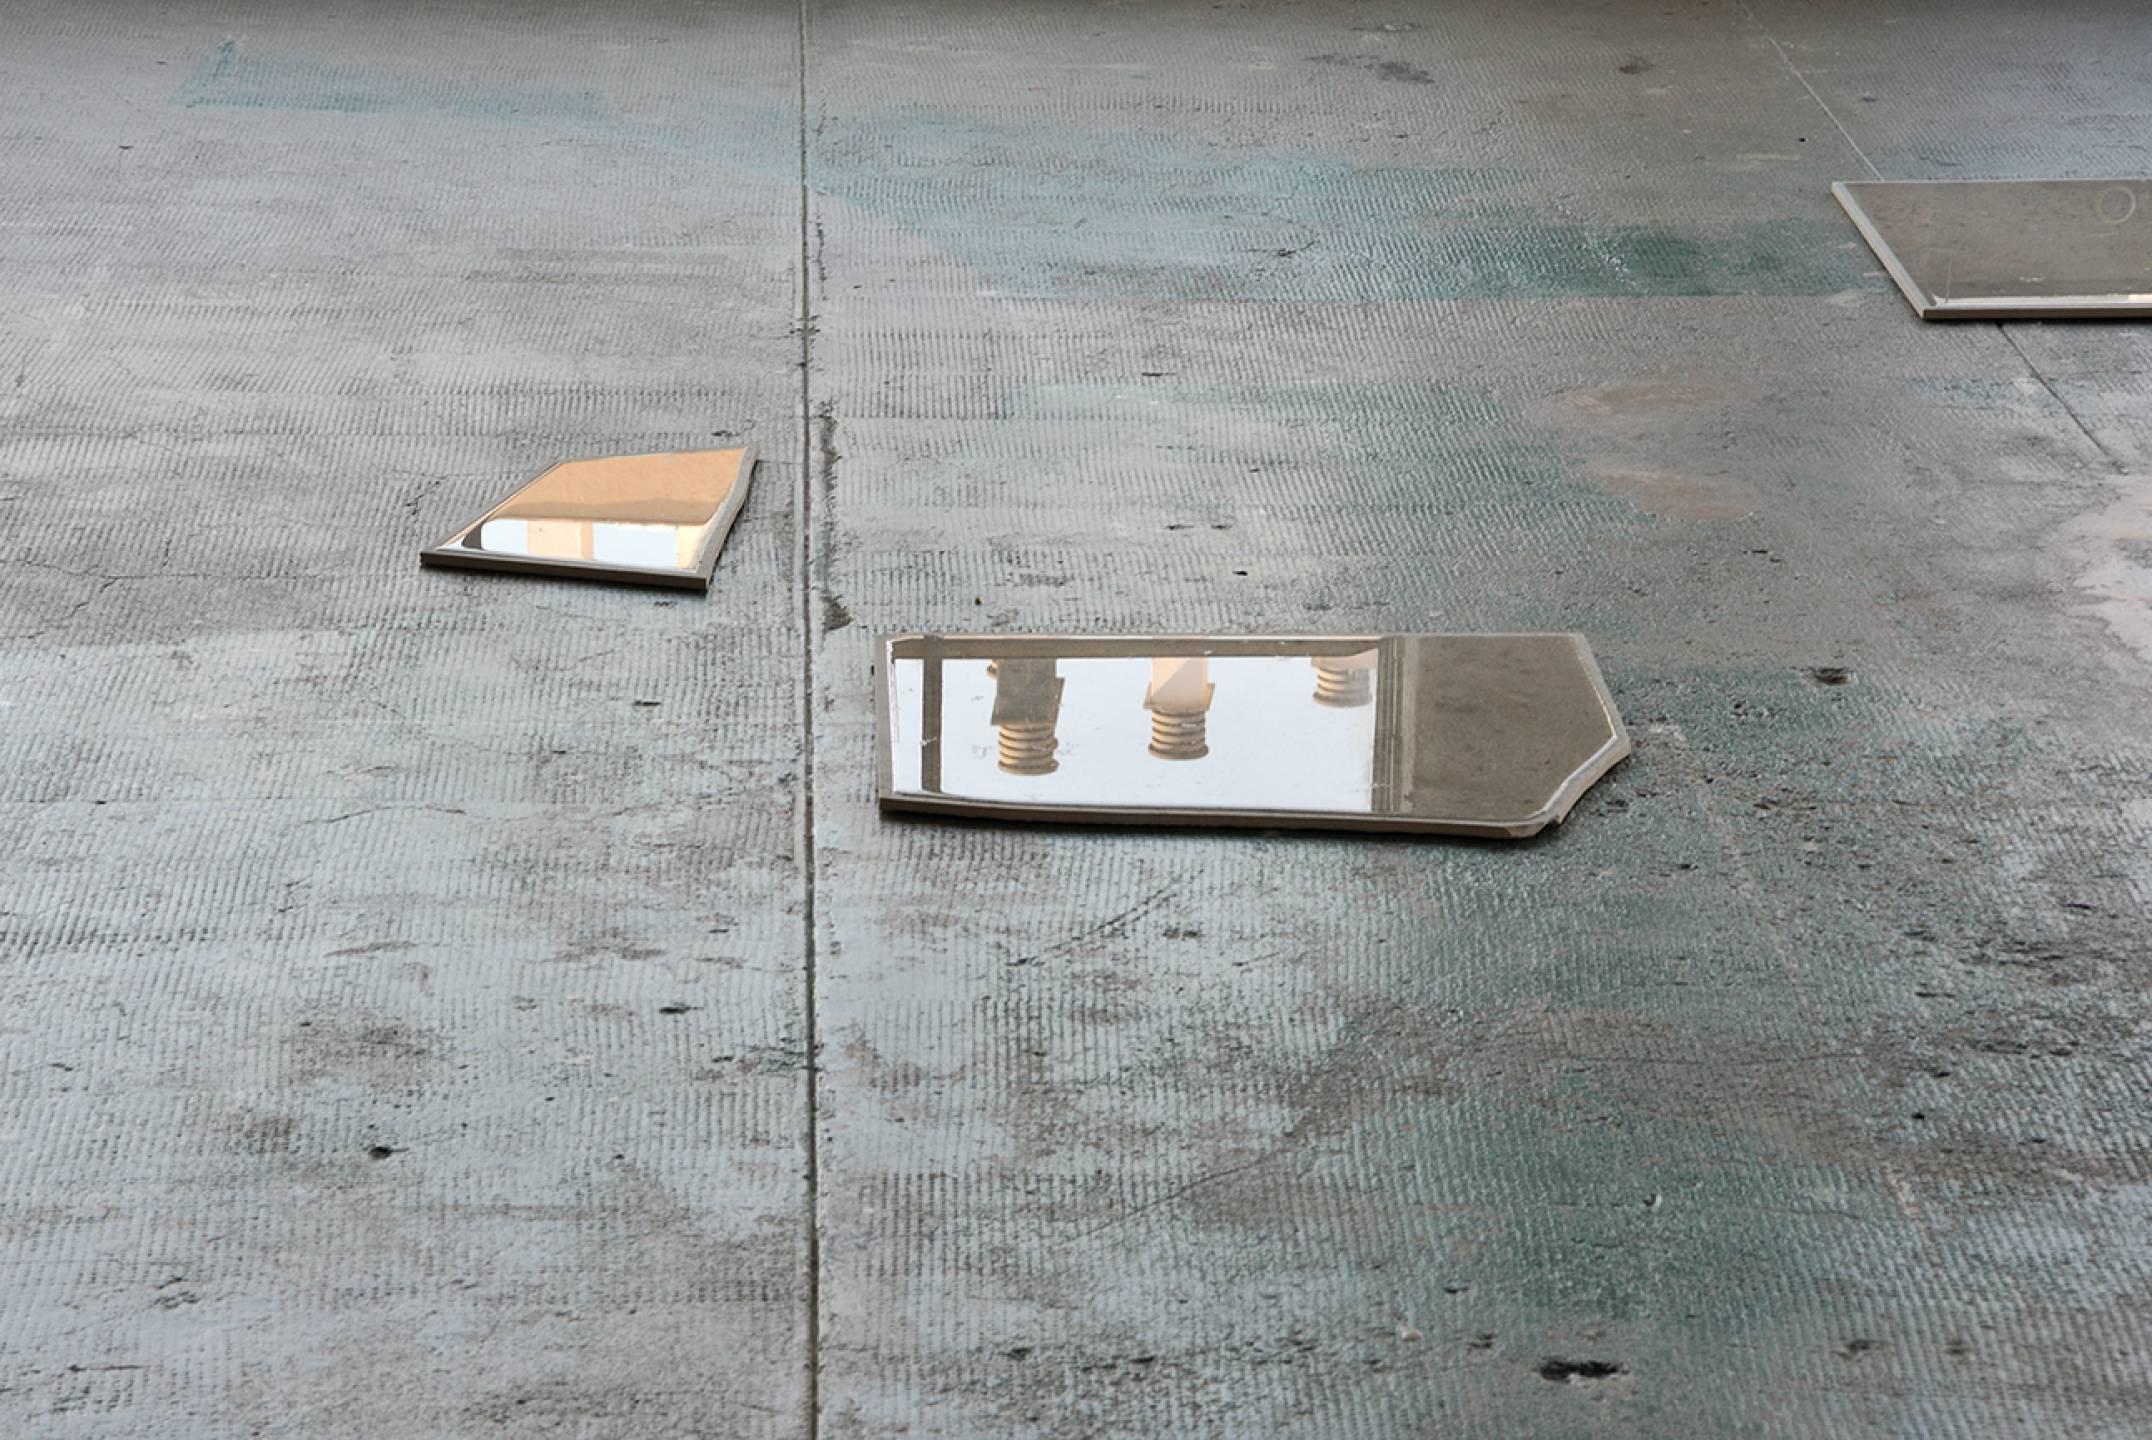 Nina Canell,&nbsp;<em>Days of Inertia</em>,&nbsp;Le Crédac, Paris, 2017 - Mendes Wood DM